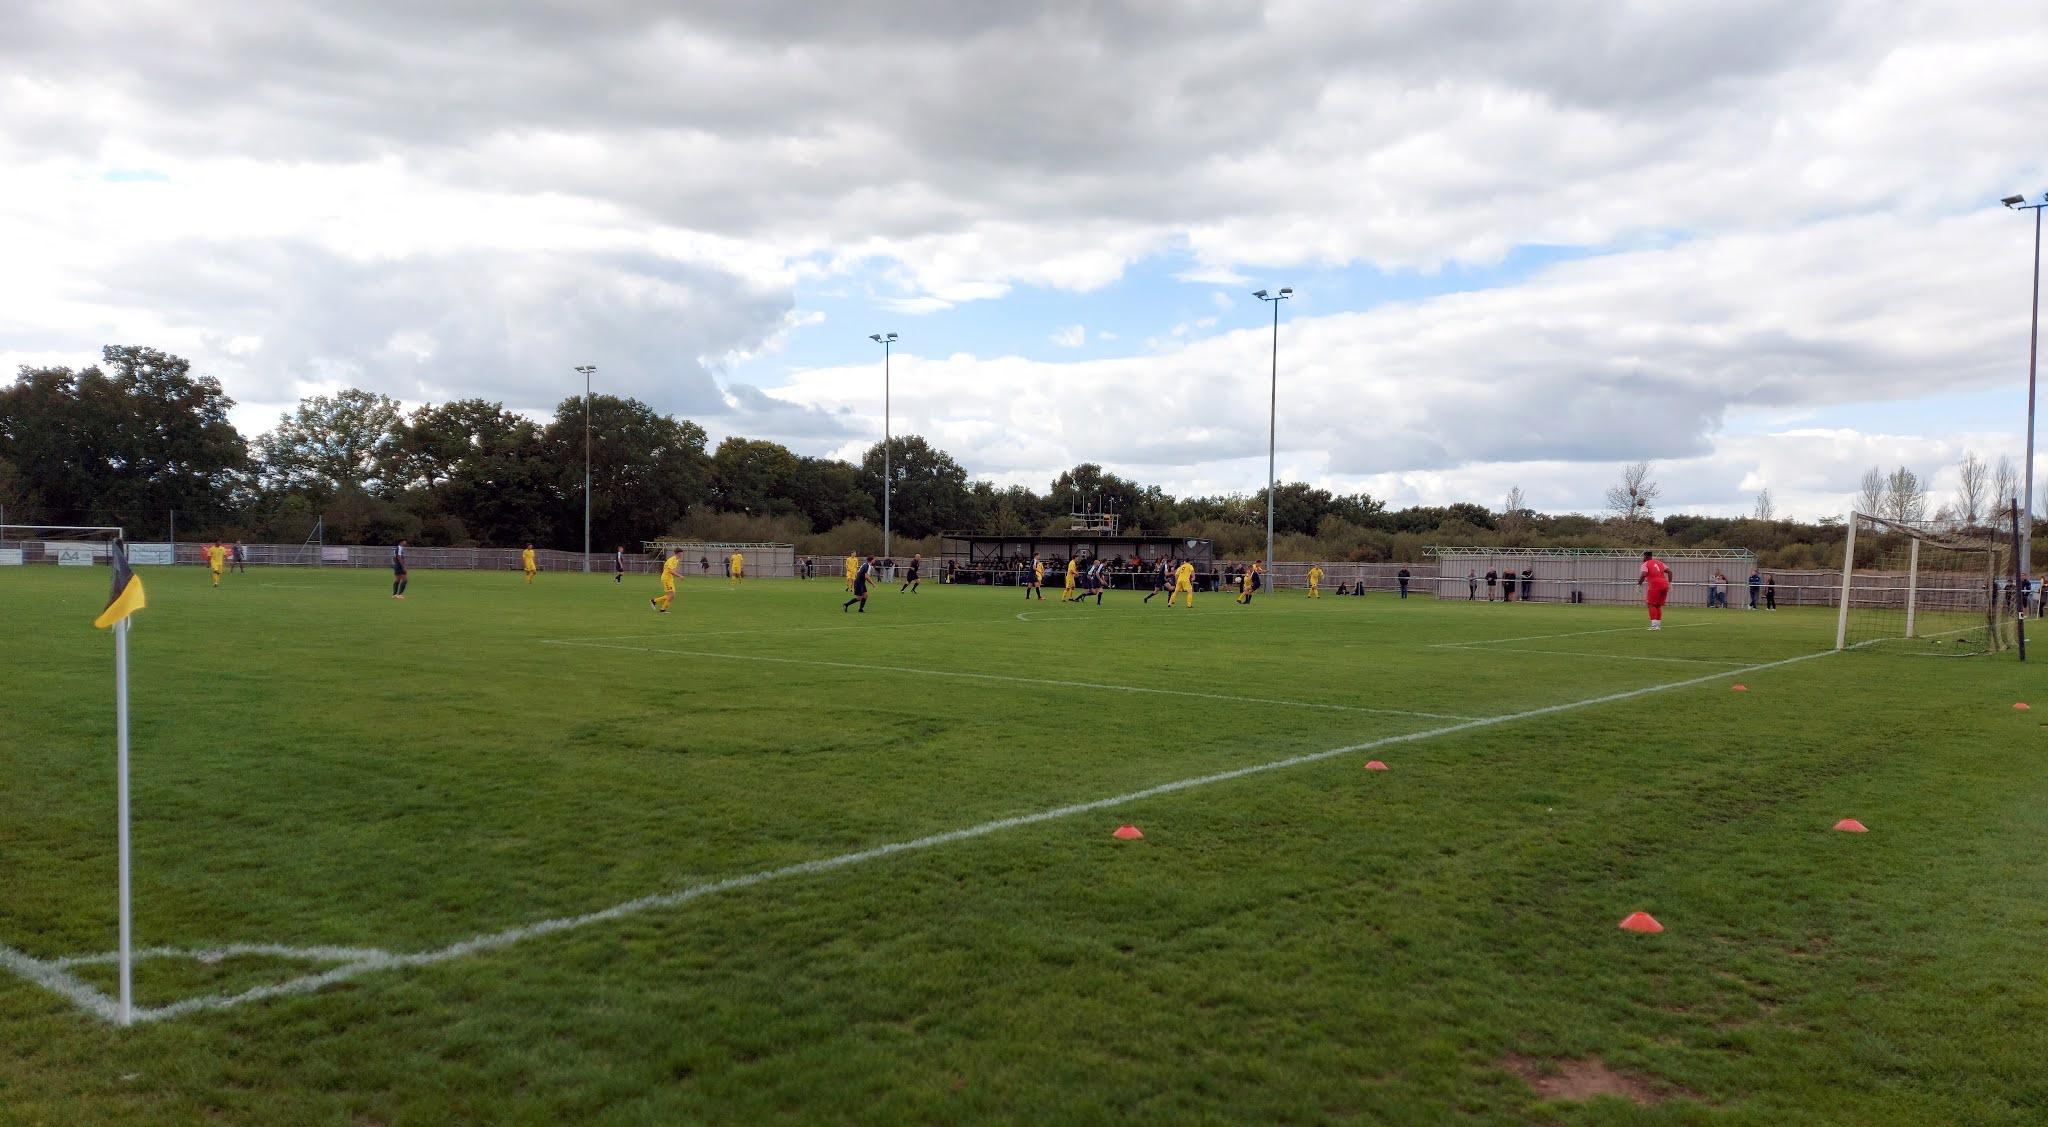 Match action at Tadley Calleva's Barlow's Park home